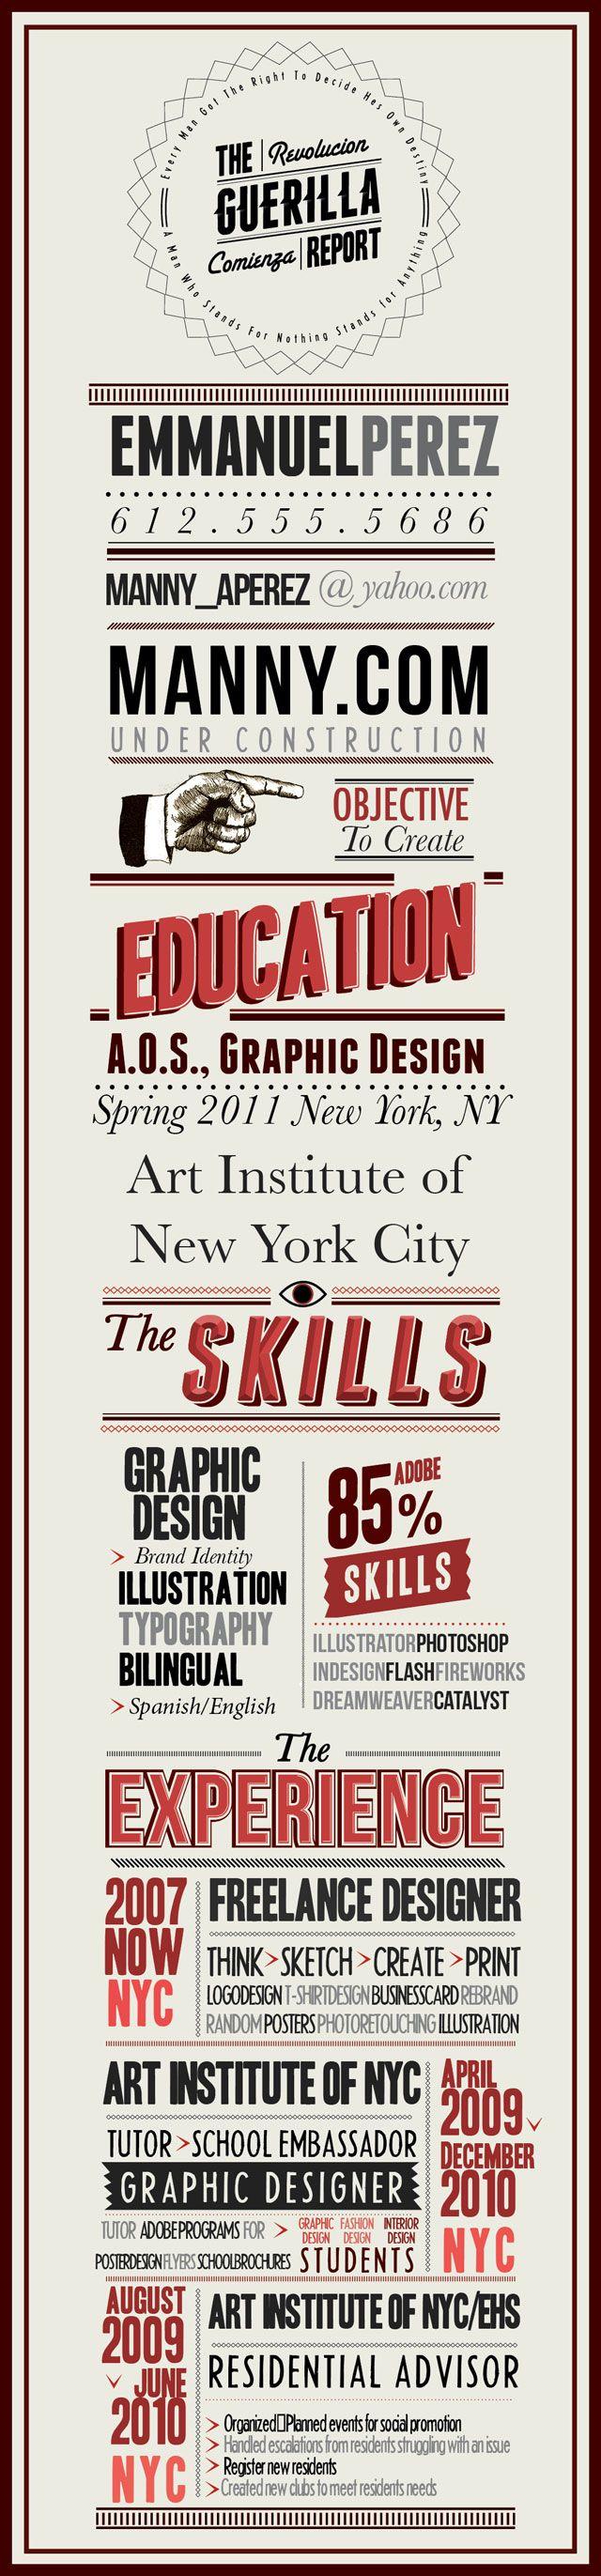 LOVELY POSTER-RESUME BY EMMANUEL PEREZ | Typography | Pinterest ...